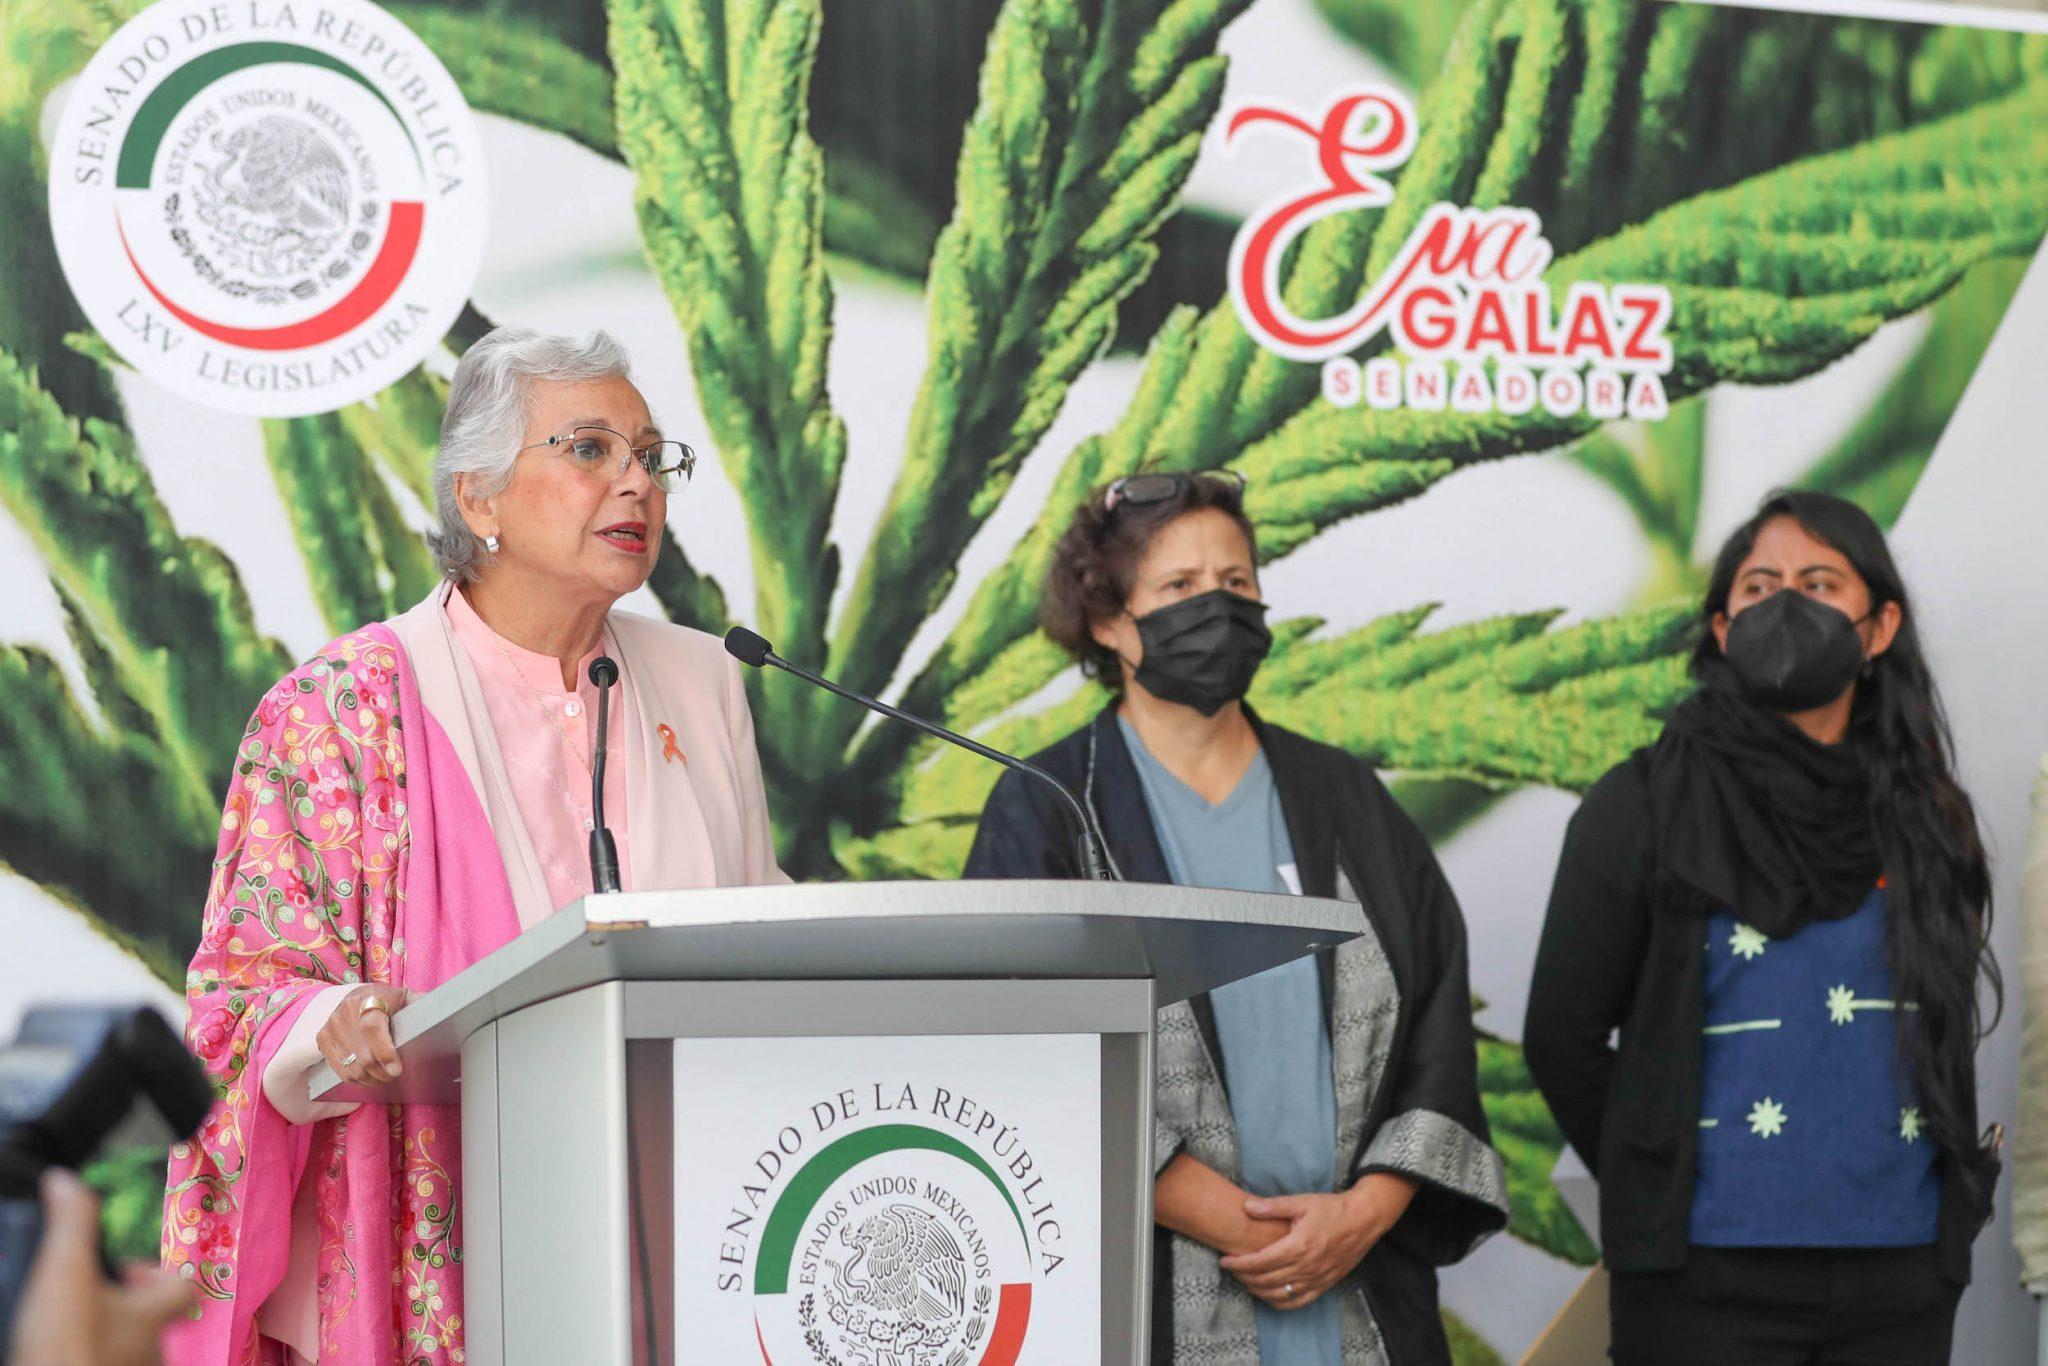 Top Mexican Senator Says Marijuana Legalization Bill May Be Taken Up Within Weeks